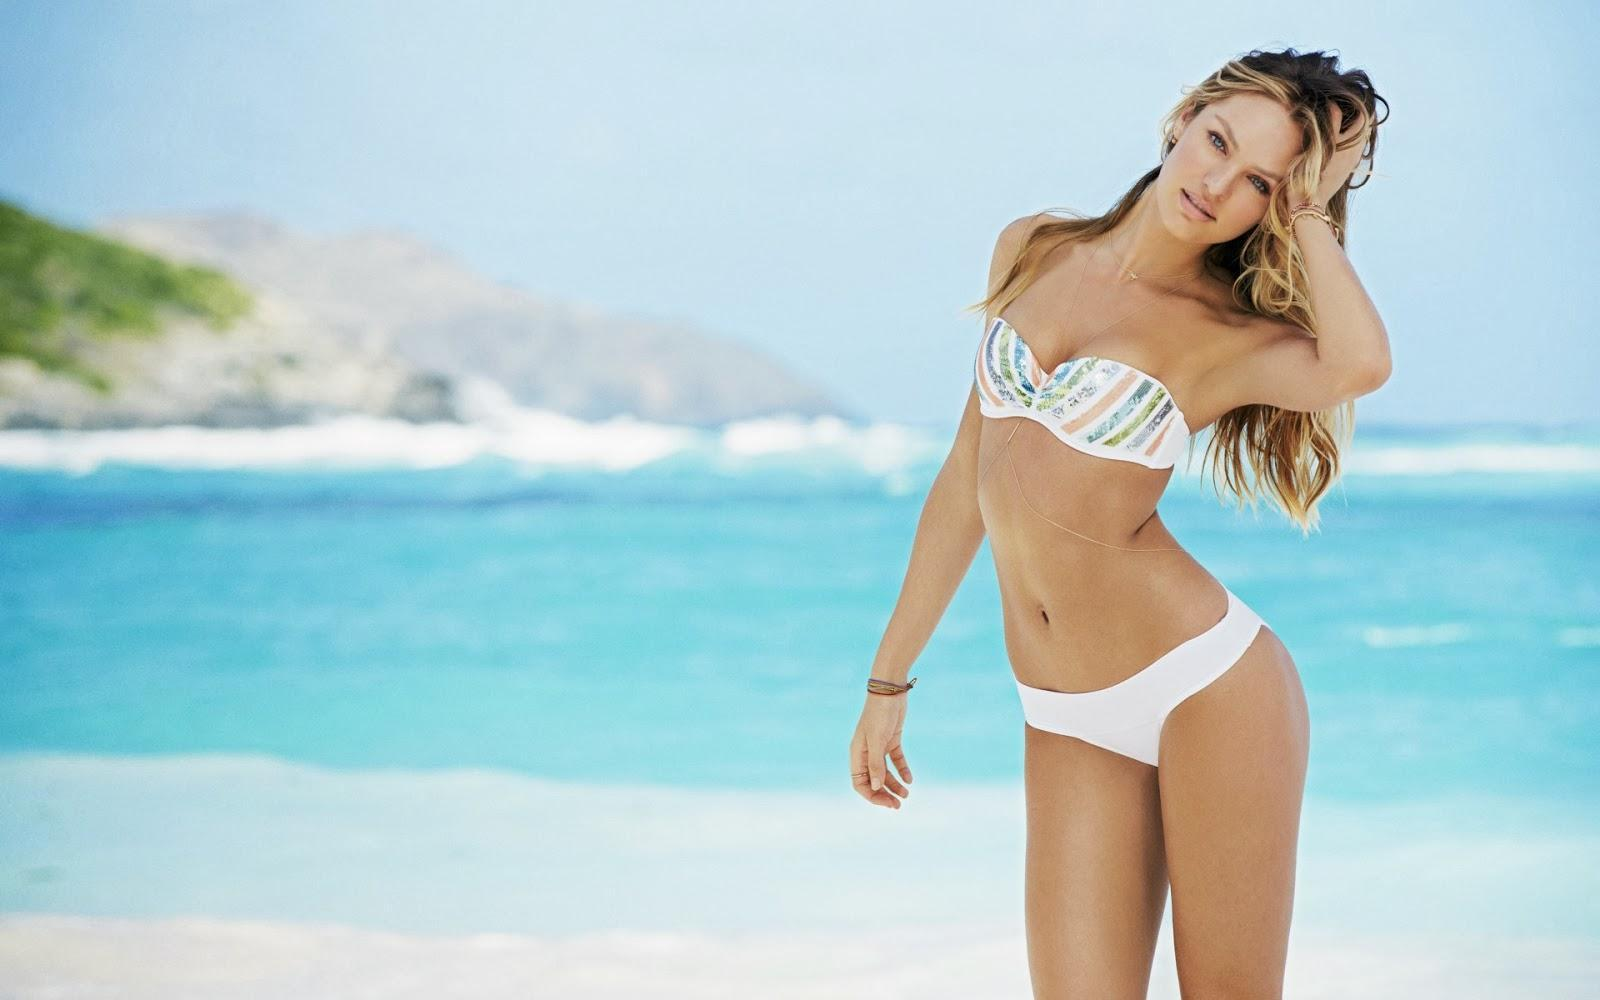 Sexy Hot Beach Bikini Girls Wallpaper For Android - Apk -2228